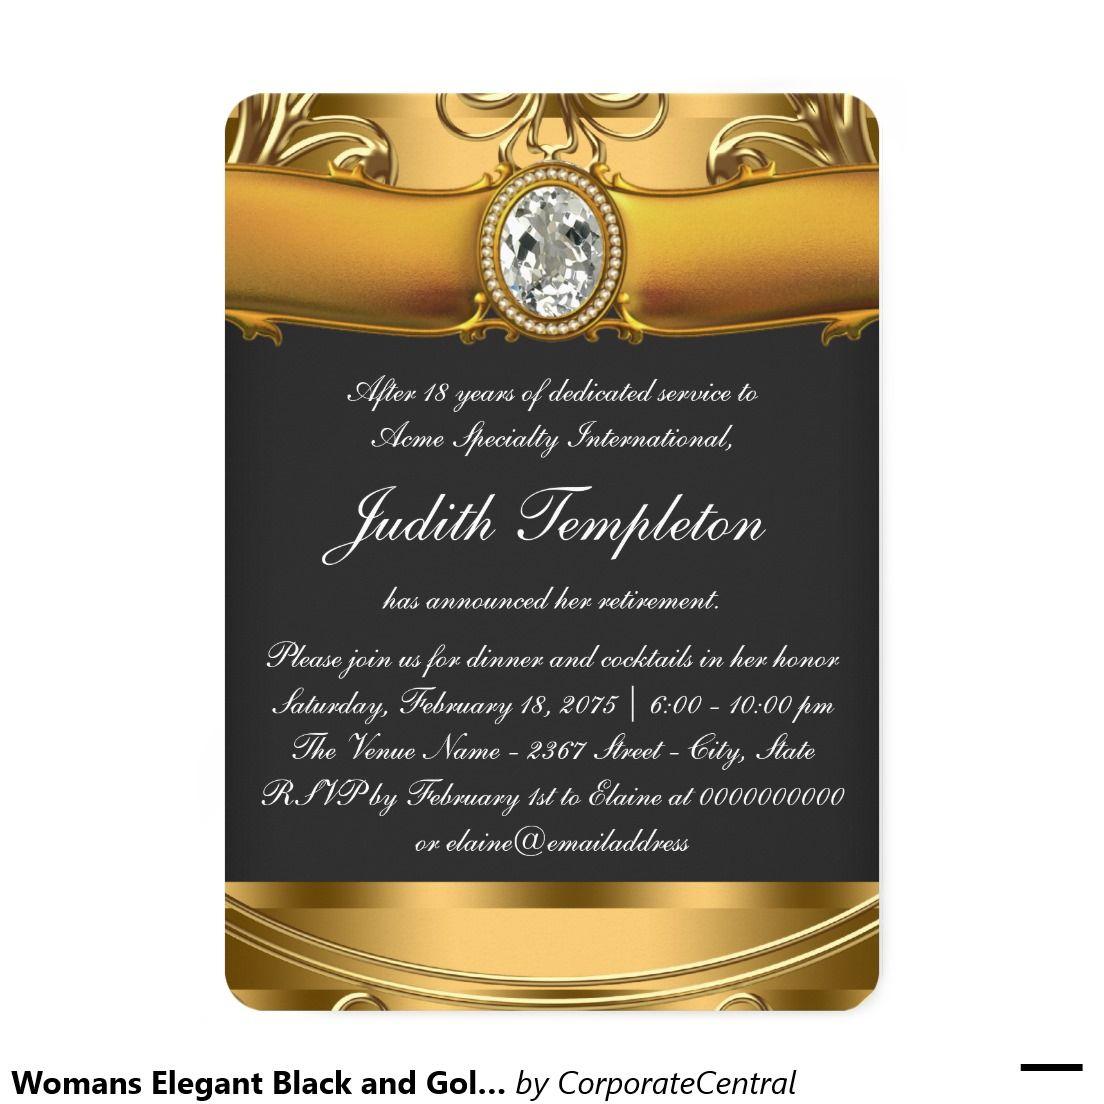 Womans Elegant Black and Gold Retirement Party Invitation ...